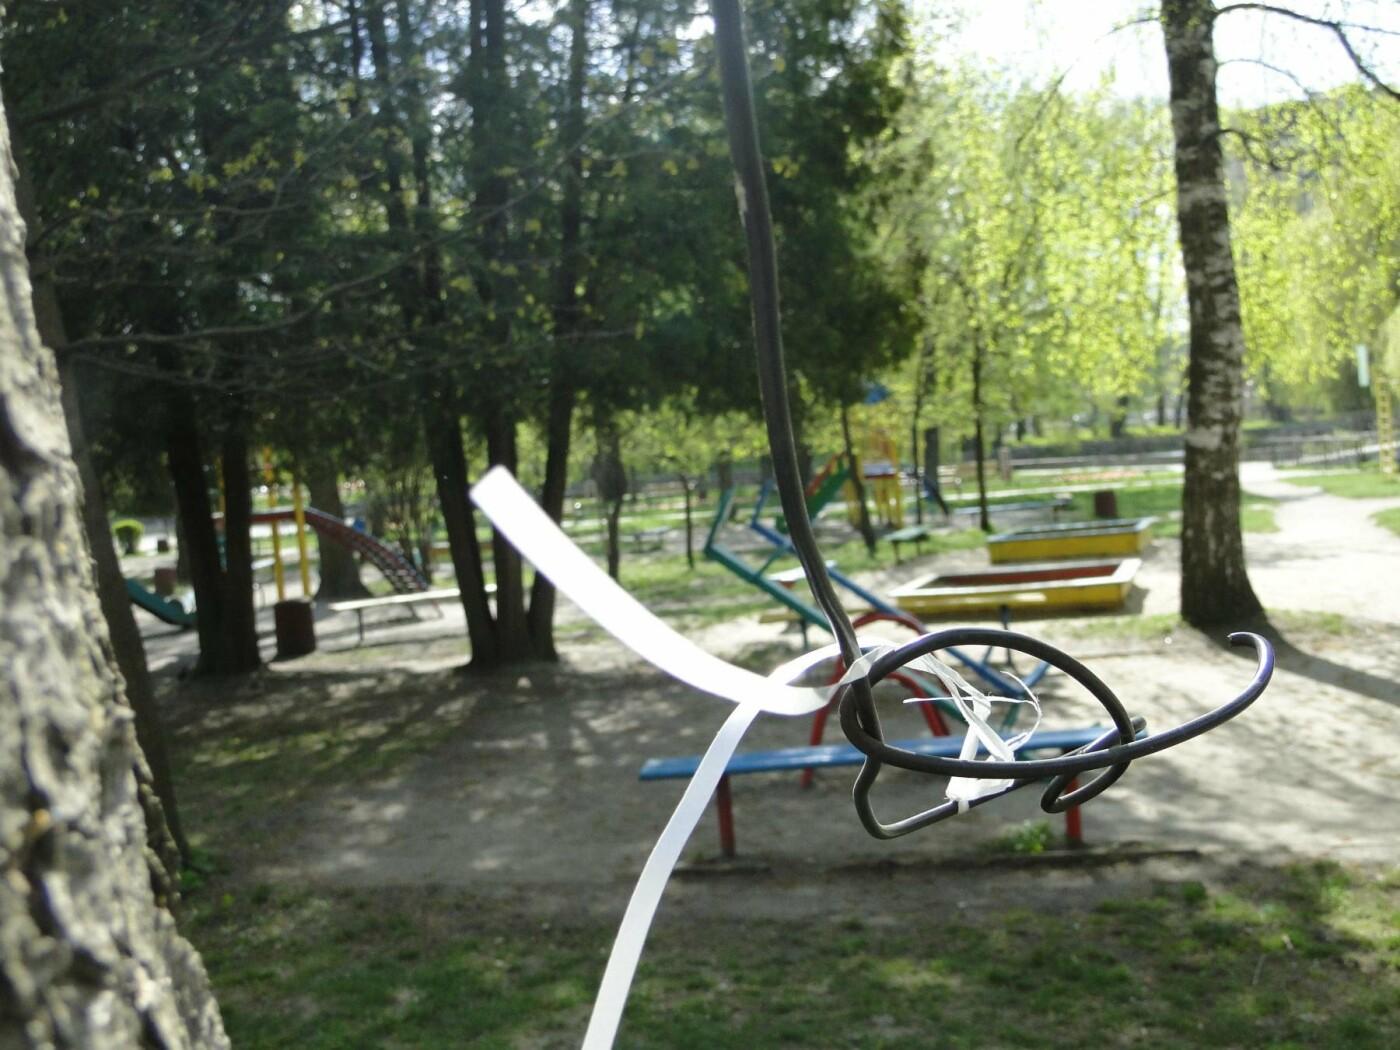 Травмоване дитинство: де зачаїлася небезпека на дитячому майданчику в парку Чекмана. ФОТО, фото-17